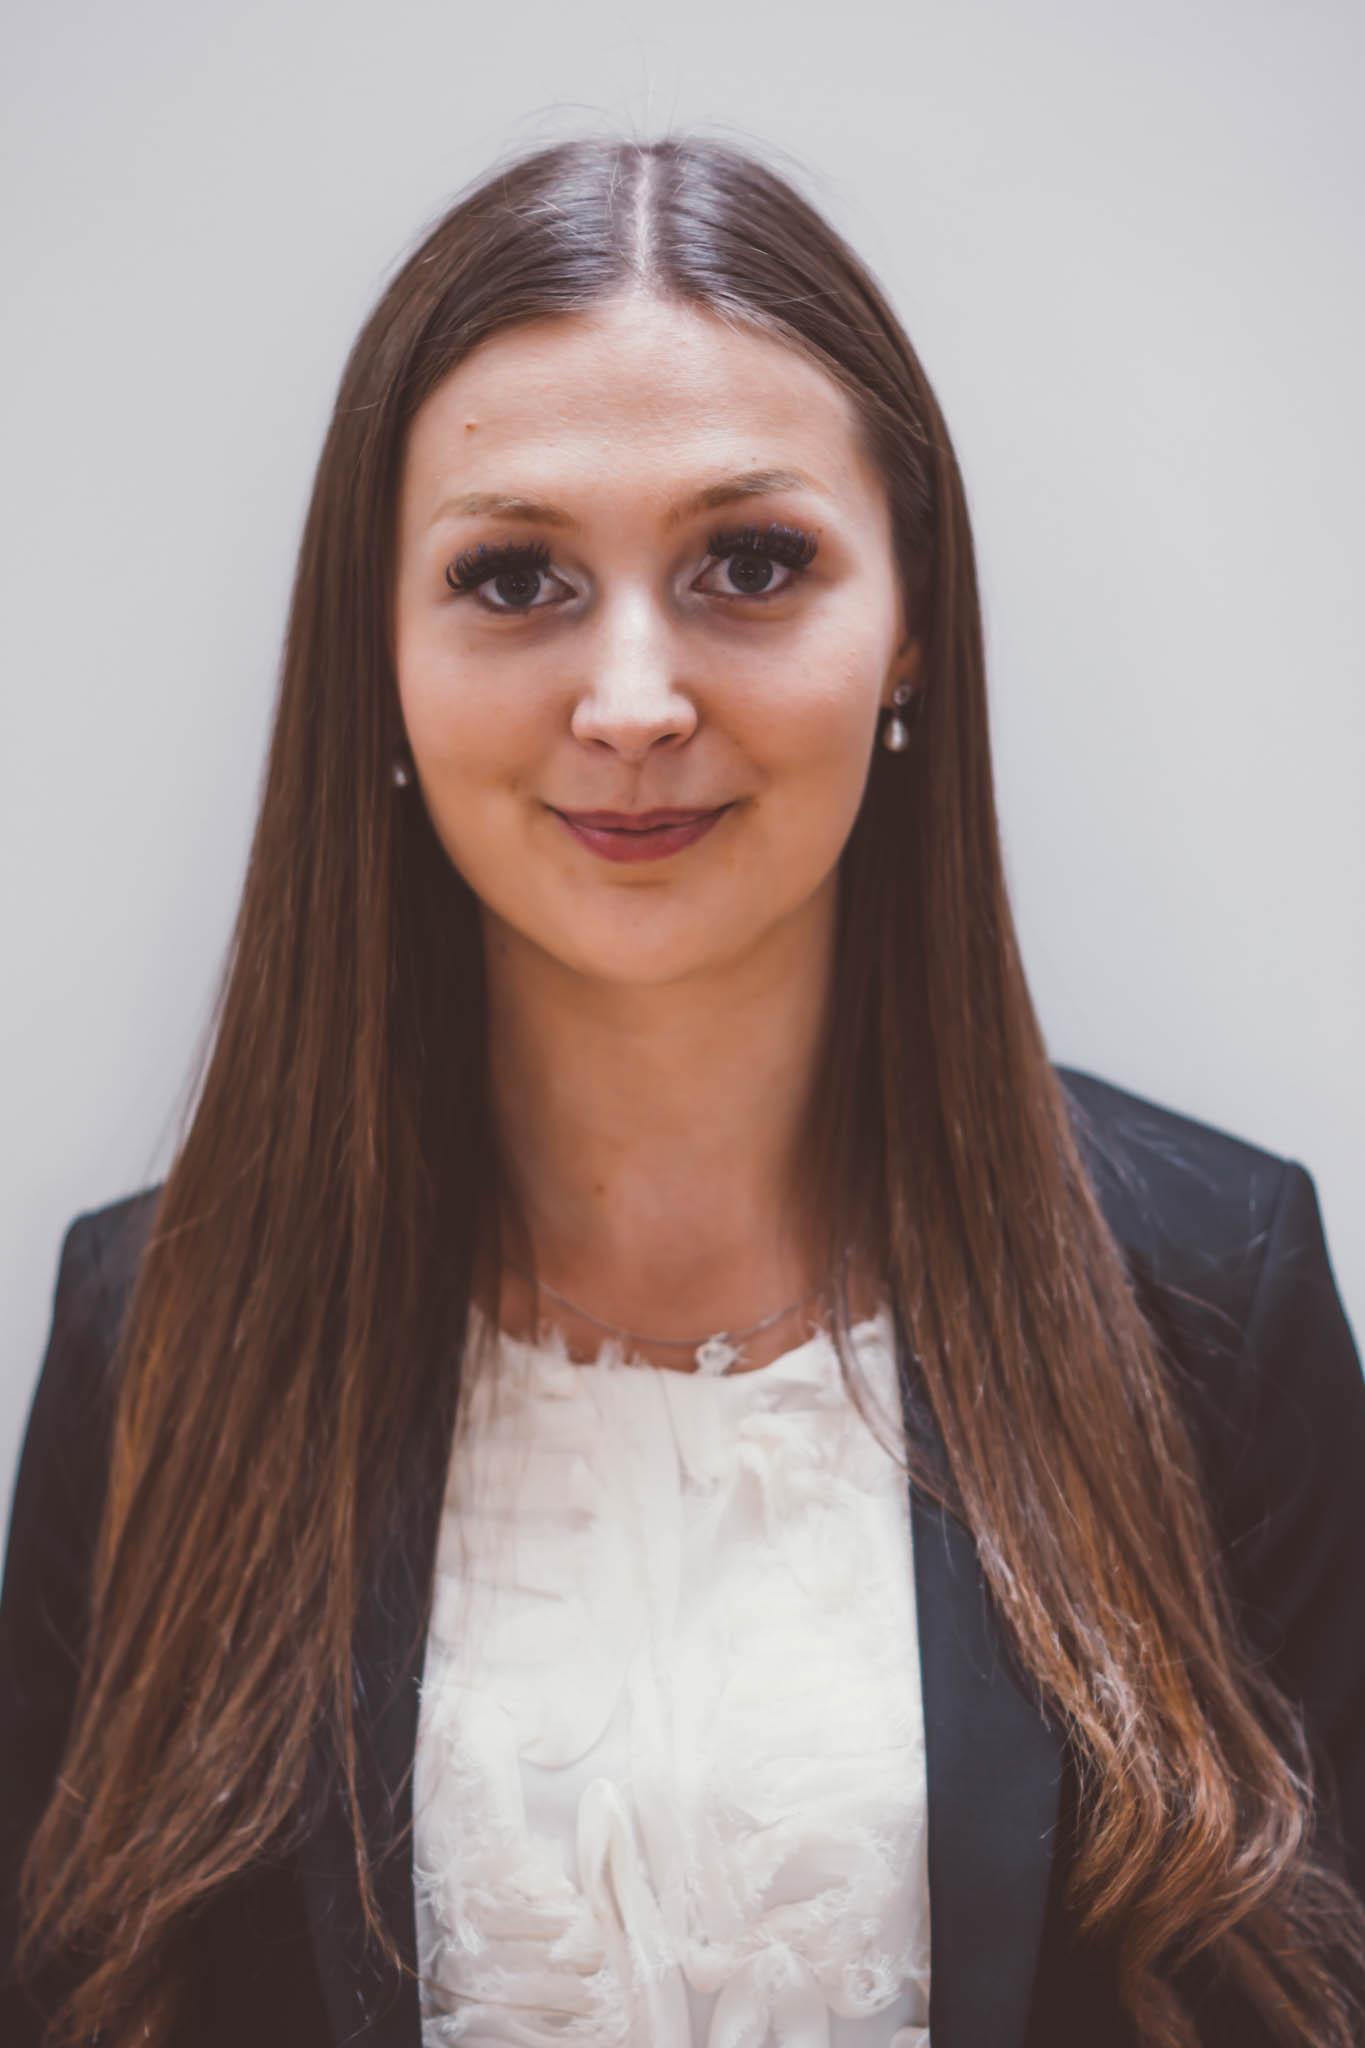 Victoria Limnefelt Nygren